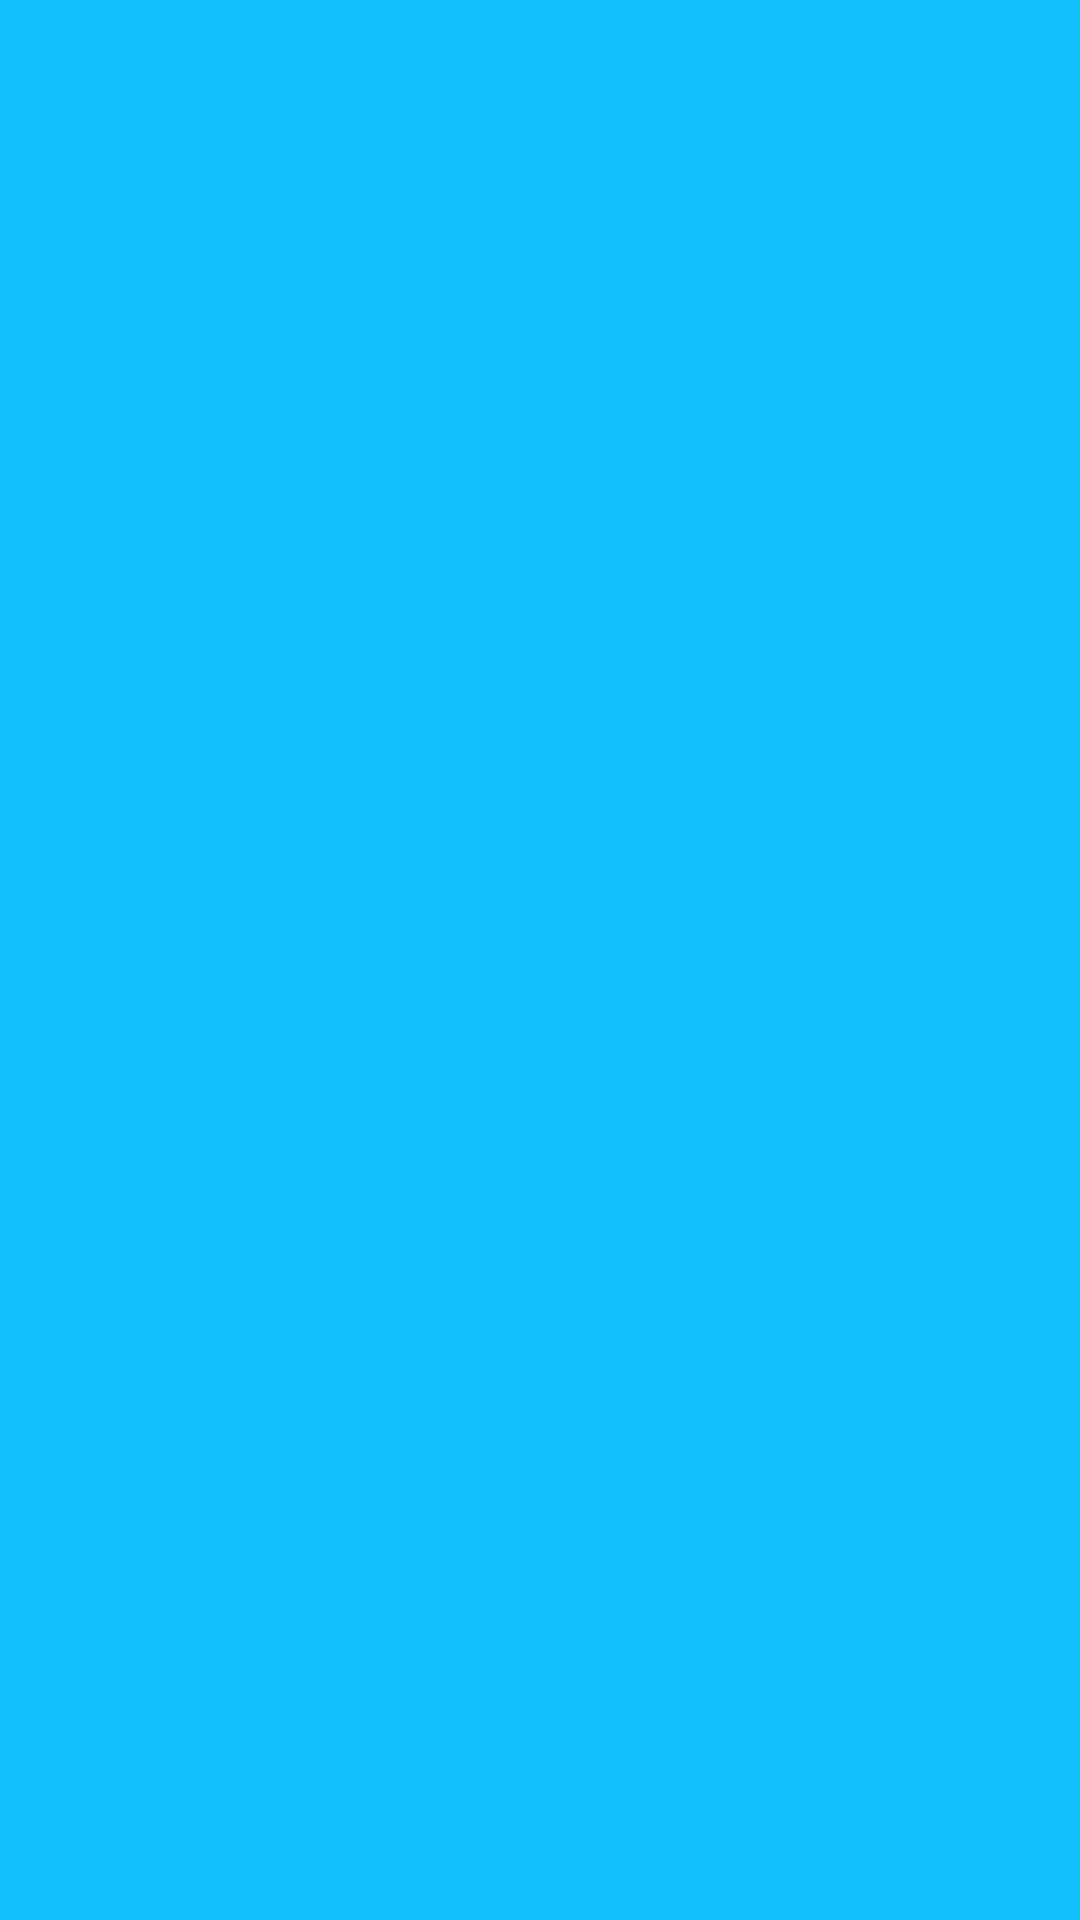 1080x1920 Spiro Disco Ball Solid Color Background